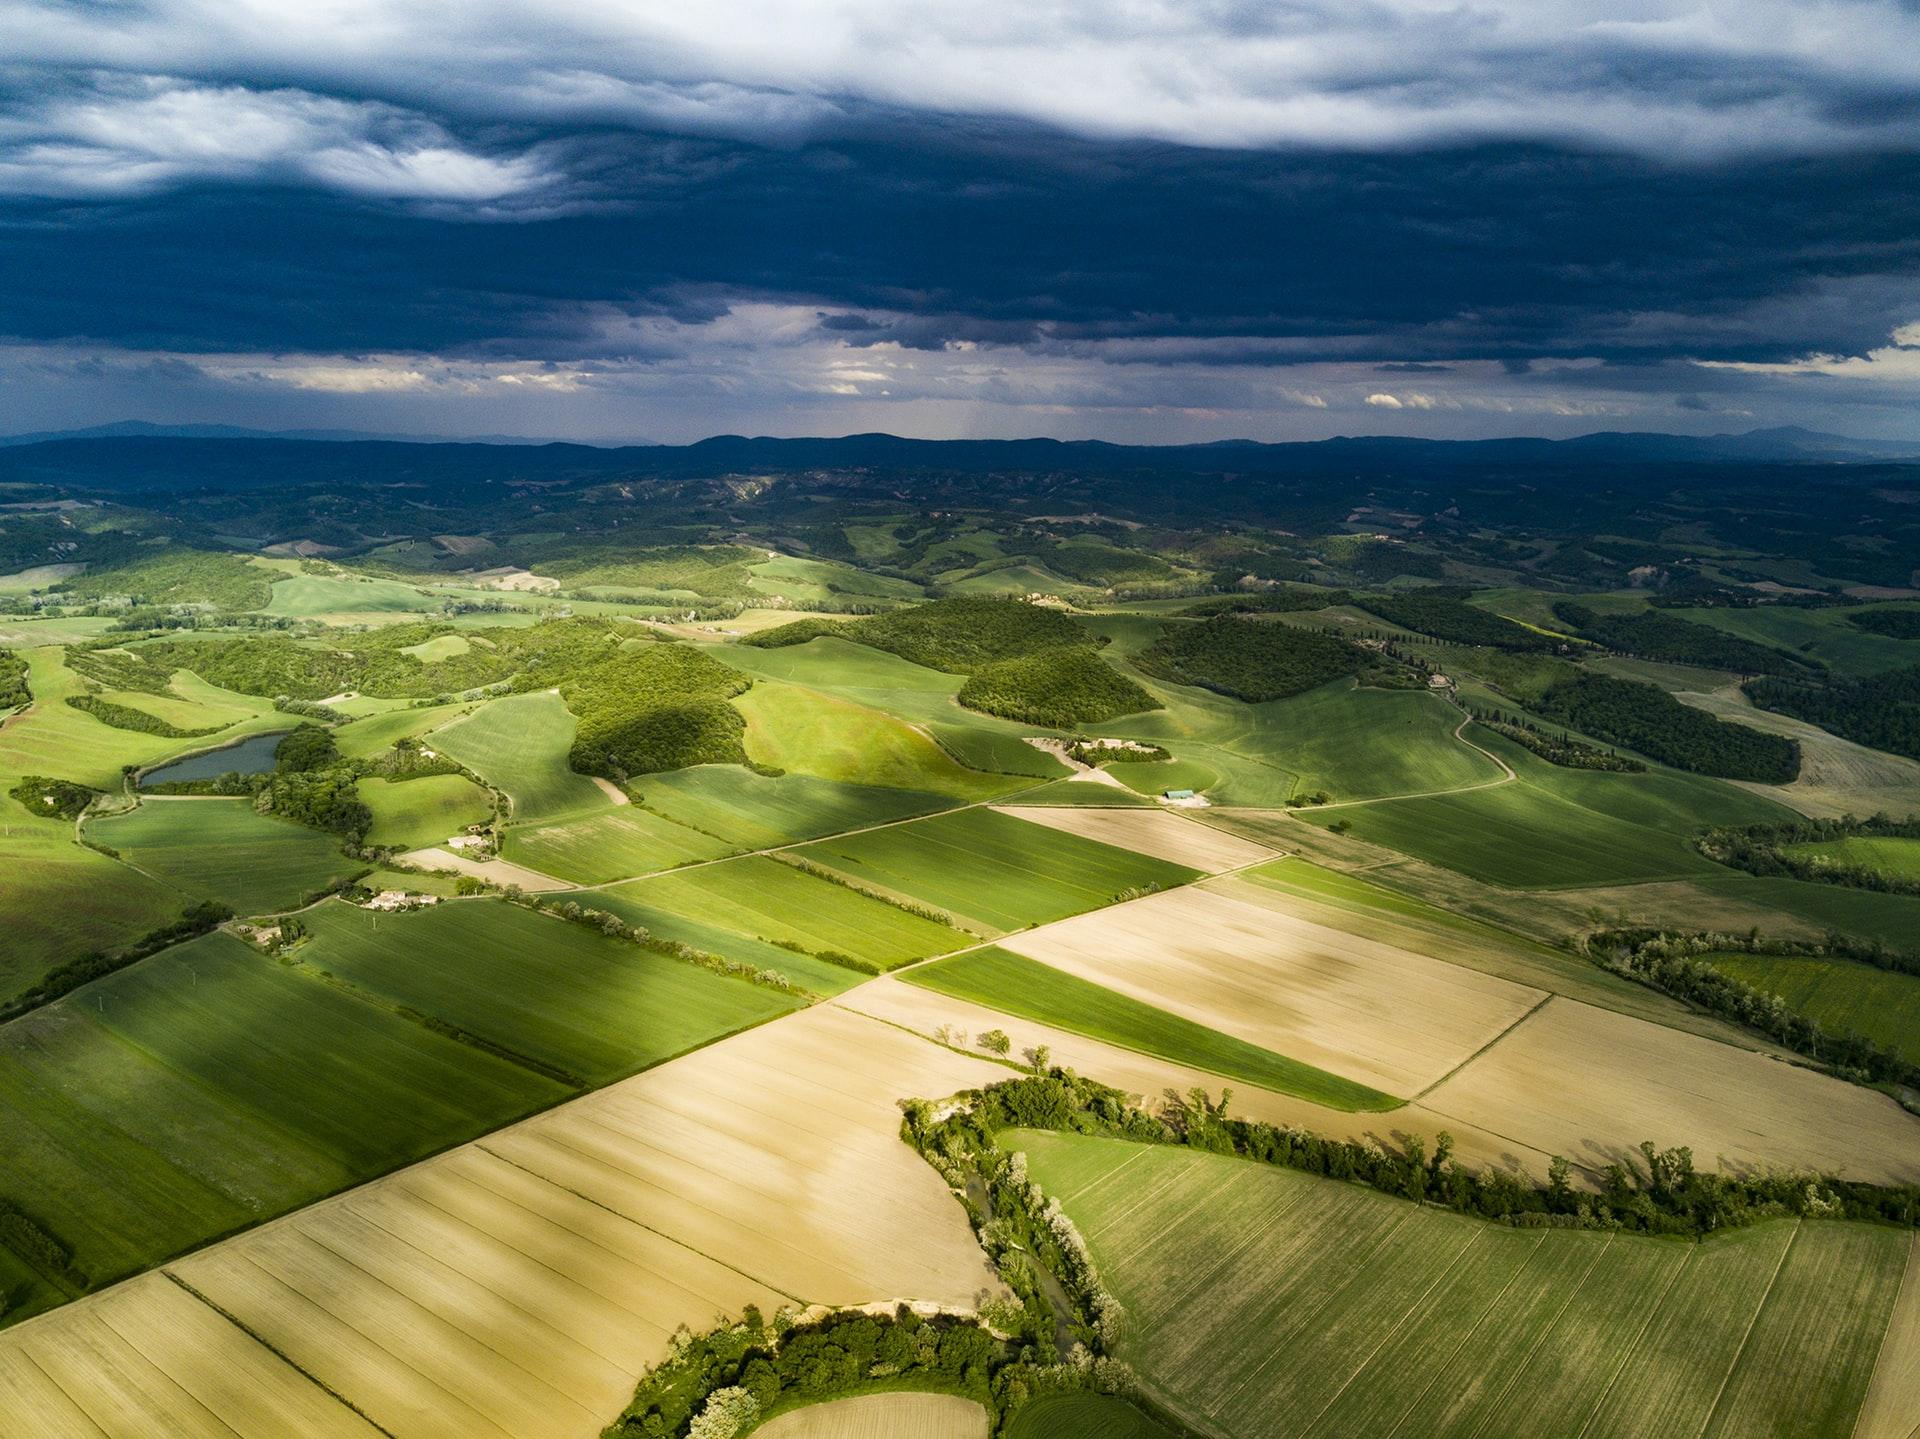 Post-pandemic future: development of farming